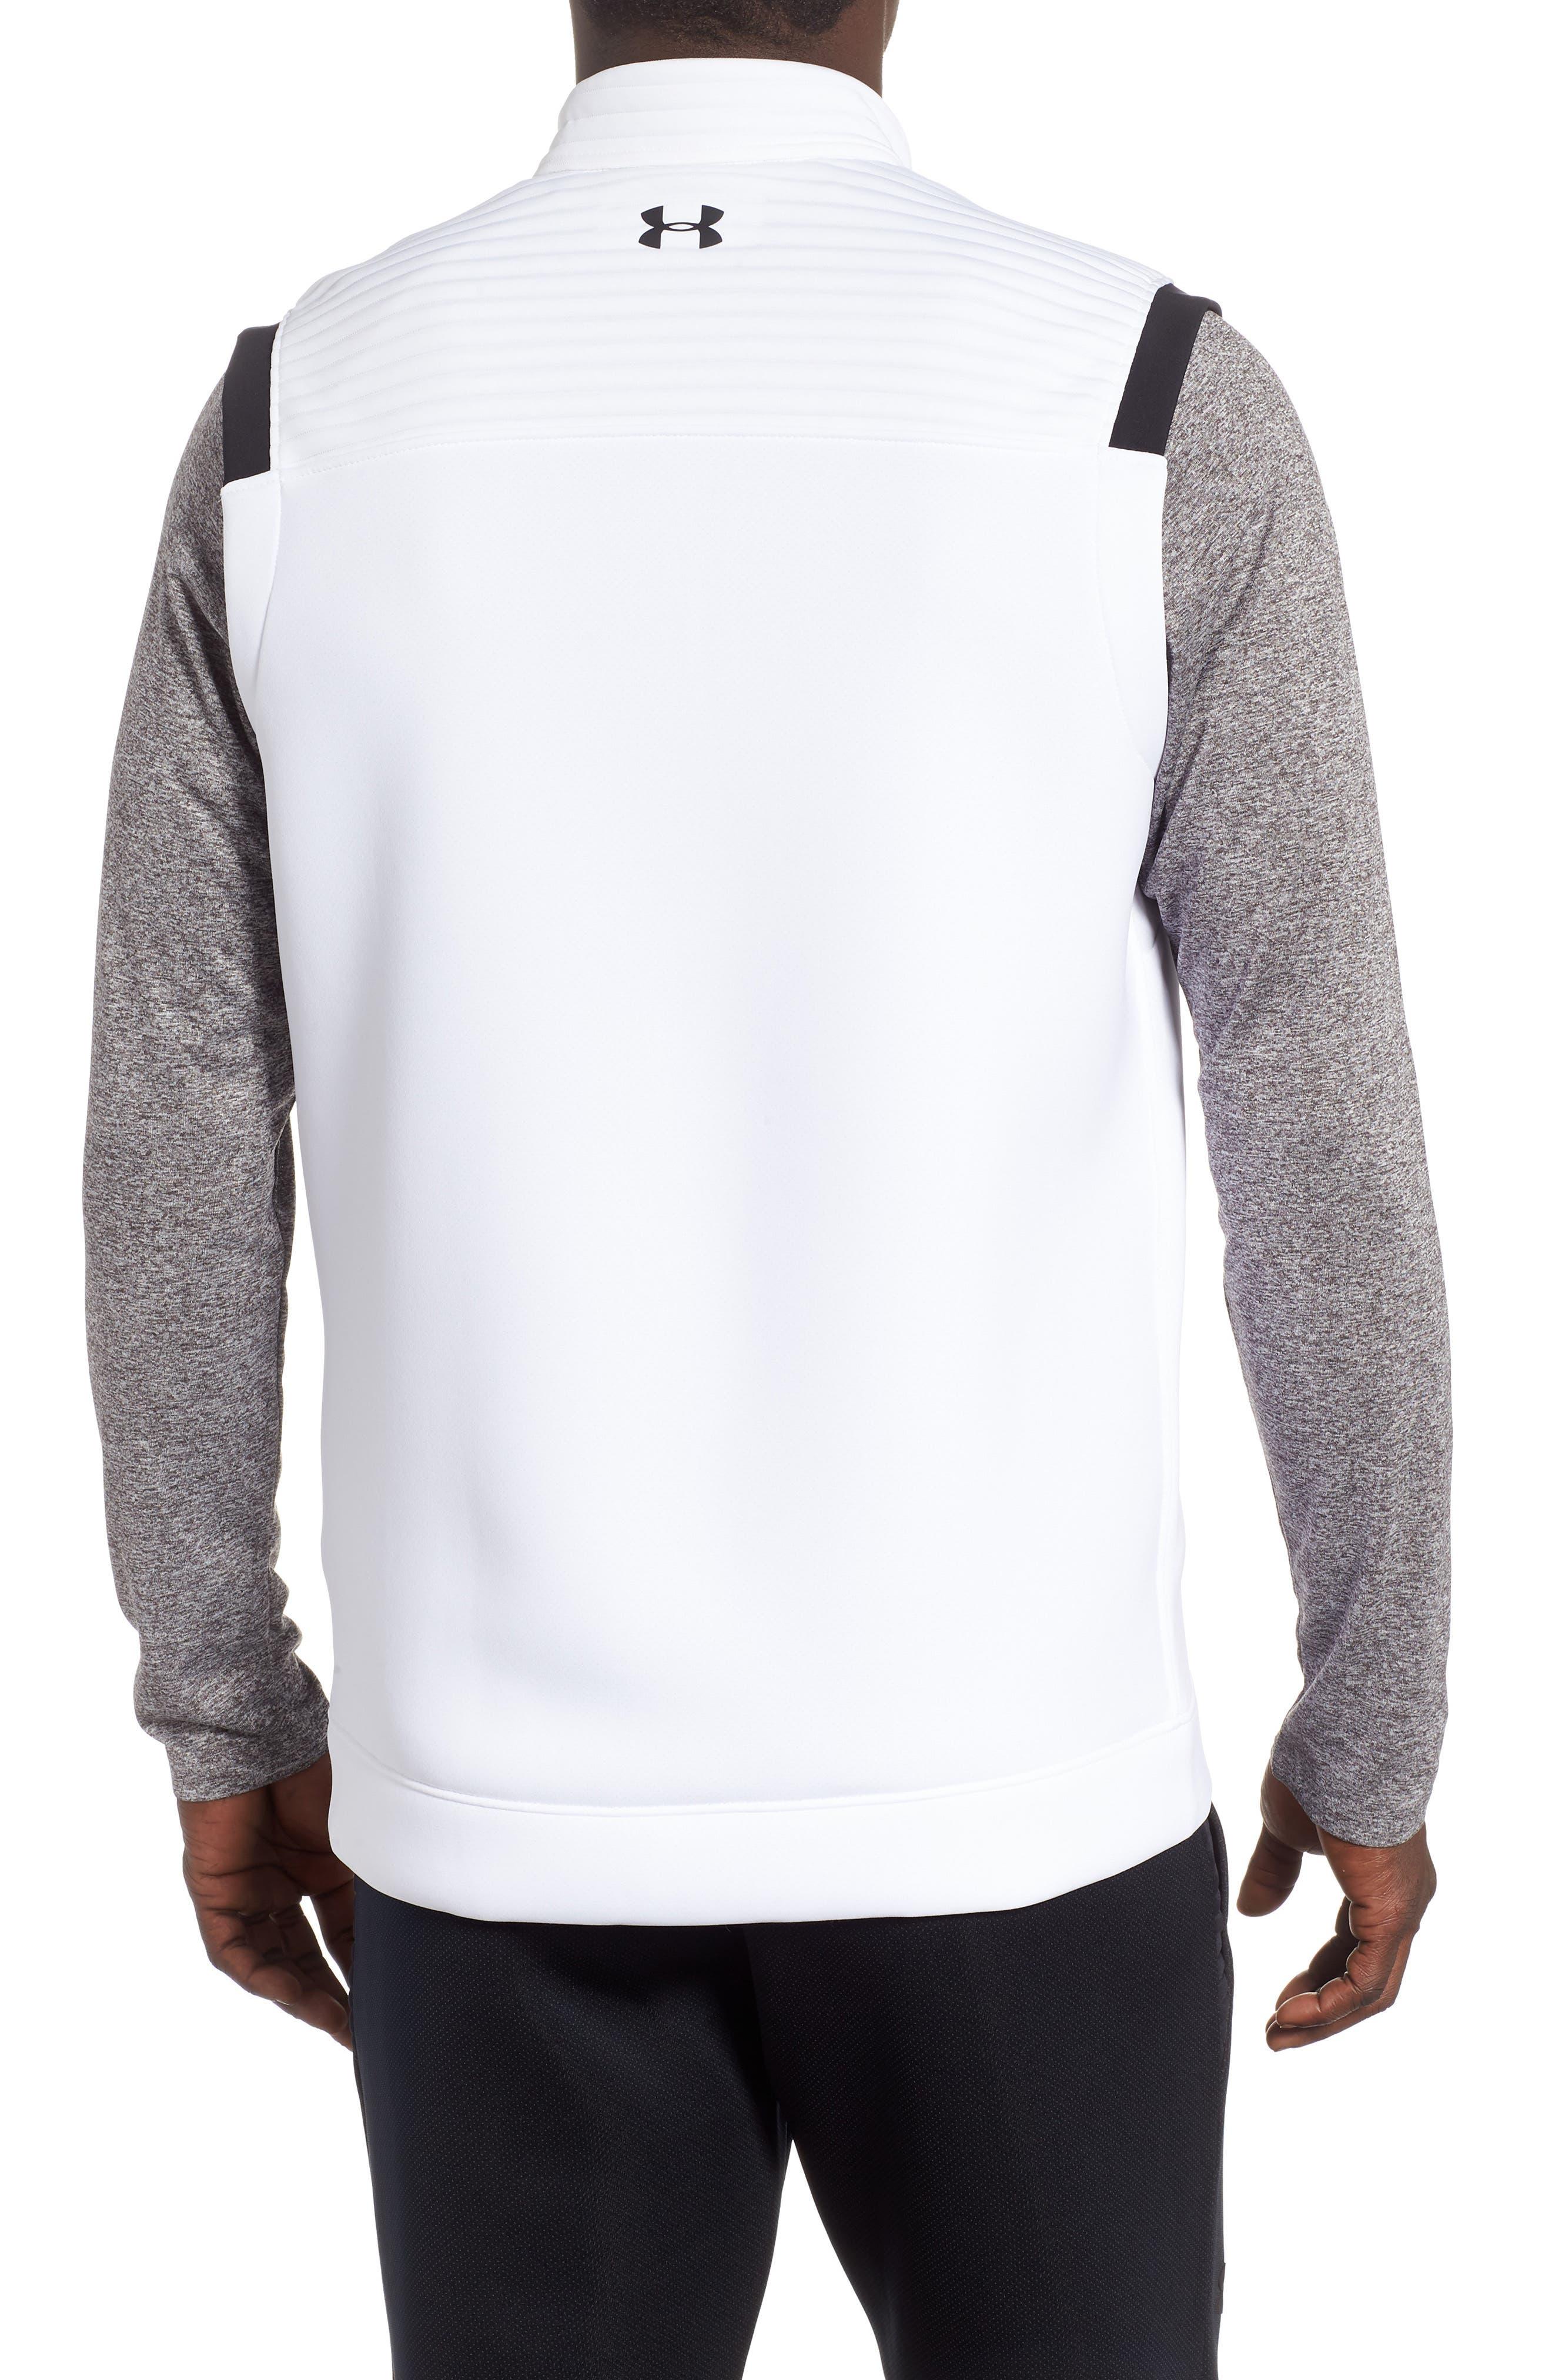 Storm Daytona Vest,                             Alternate thumbnail 2, color,                             WHITE/ BLACK/ BLACK